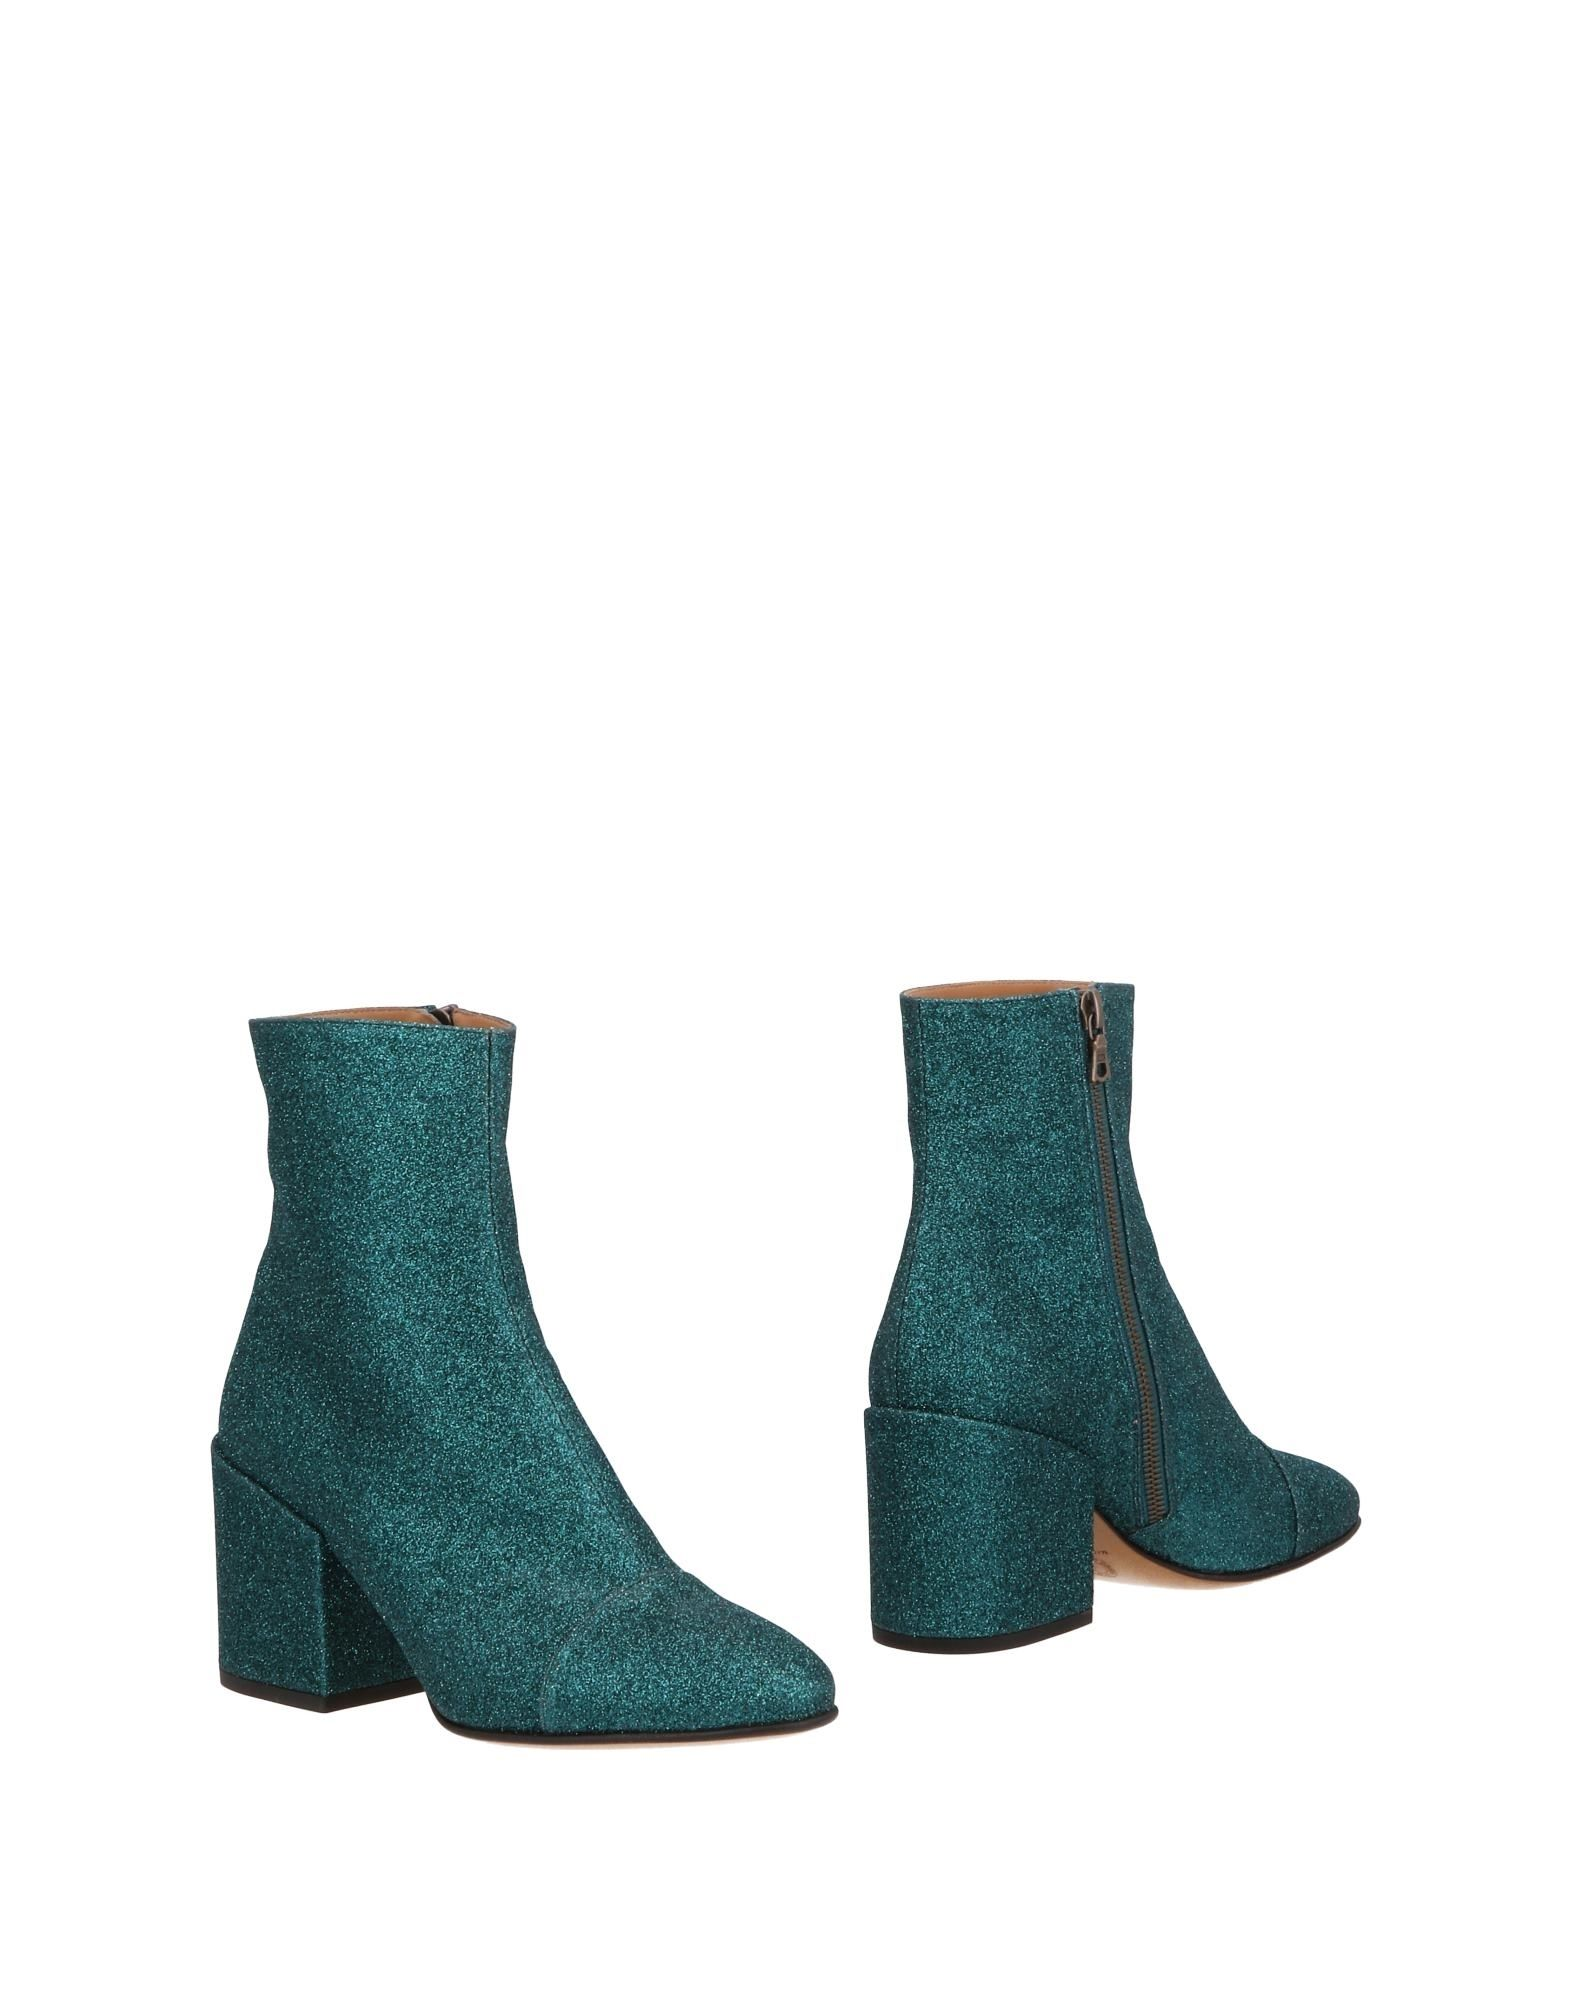 Bottine Dries Van Noten Femme - Bottines Dries Van Noten Turquoise Chaussures femme pas cher homme et femme